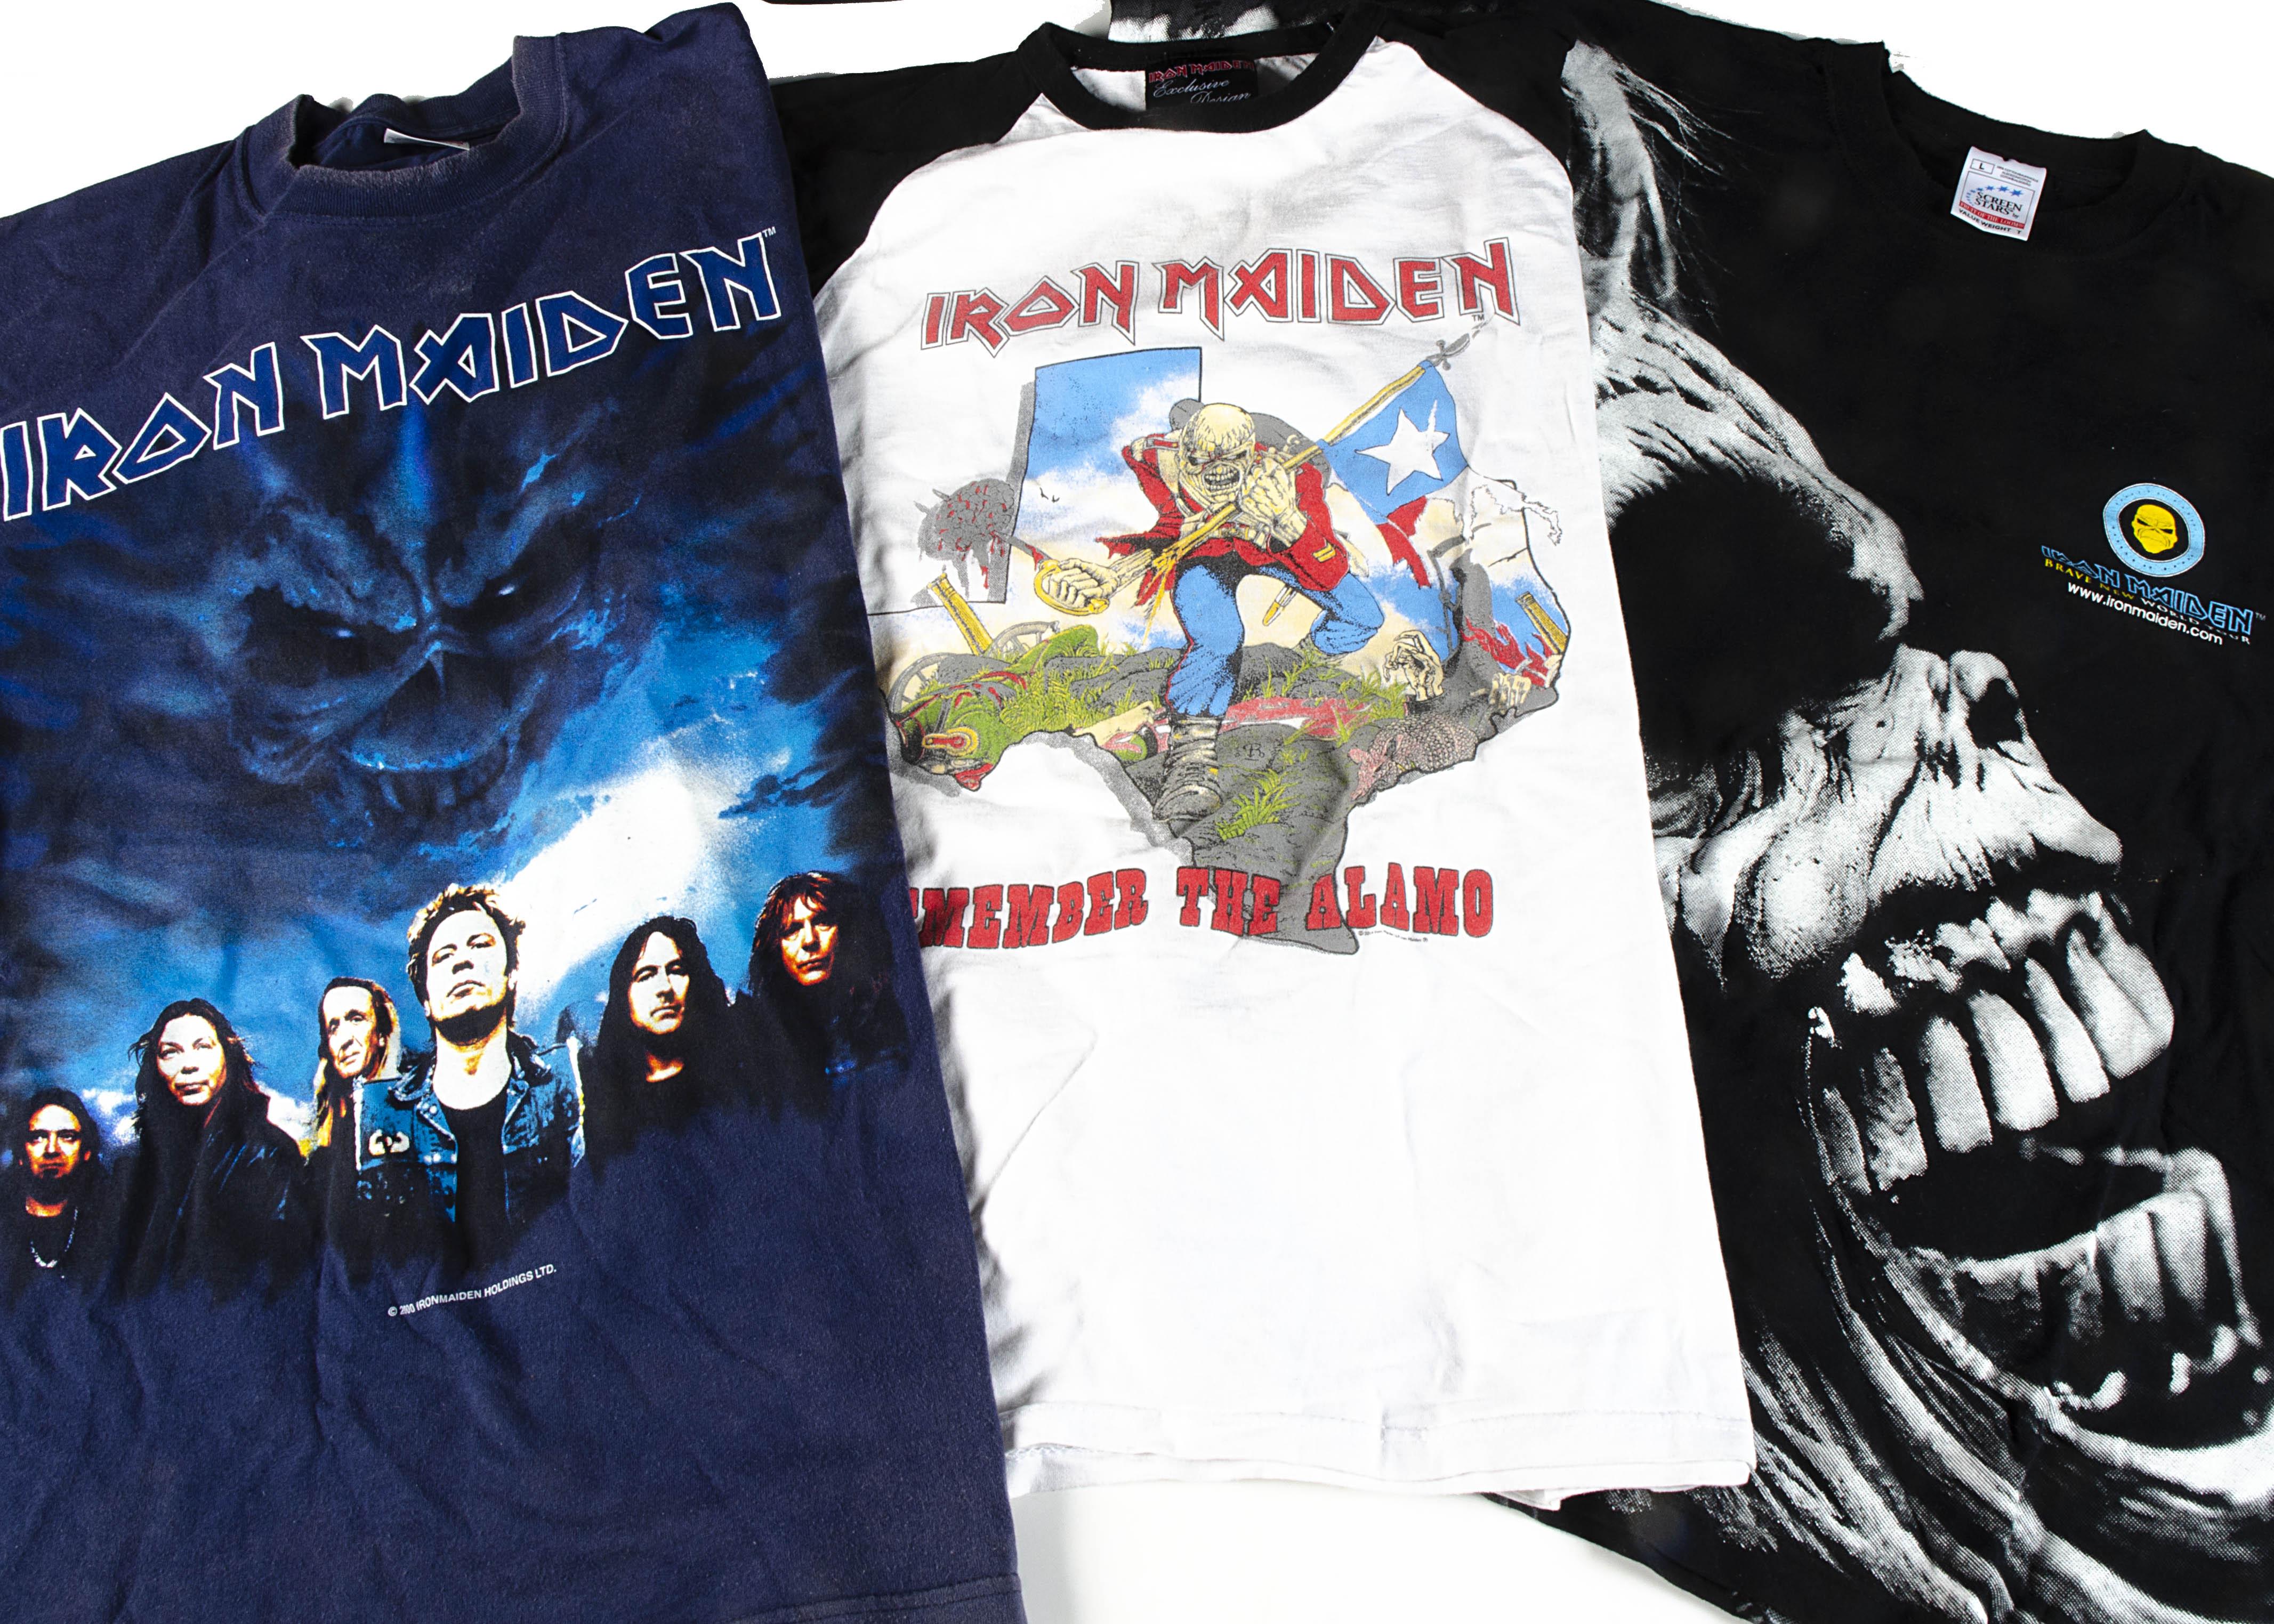 Iron Maiden 'T' Shirts, three Iron Maiden 'T' shirts - Brave New World Tour 2000/01 sized L very